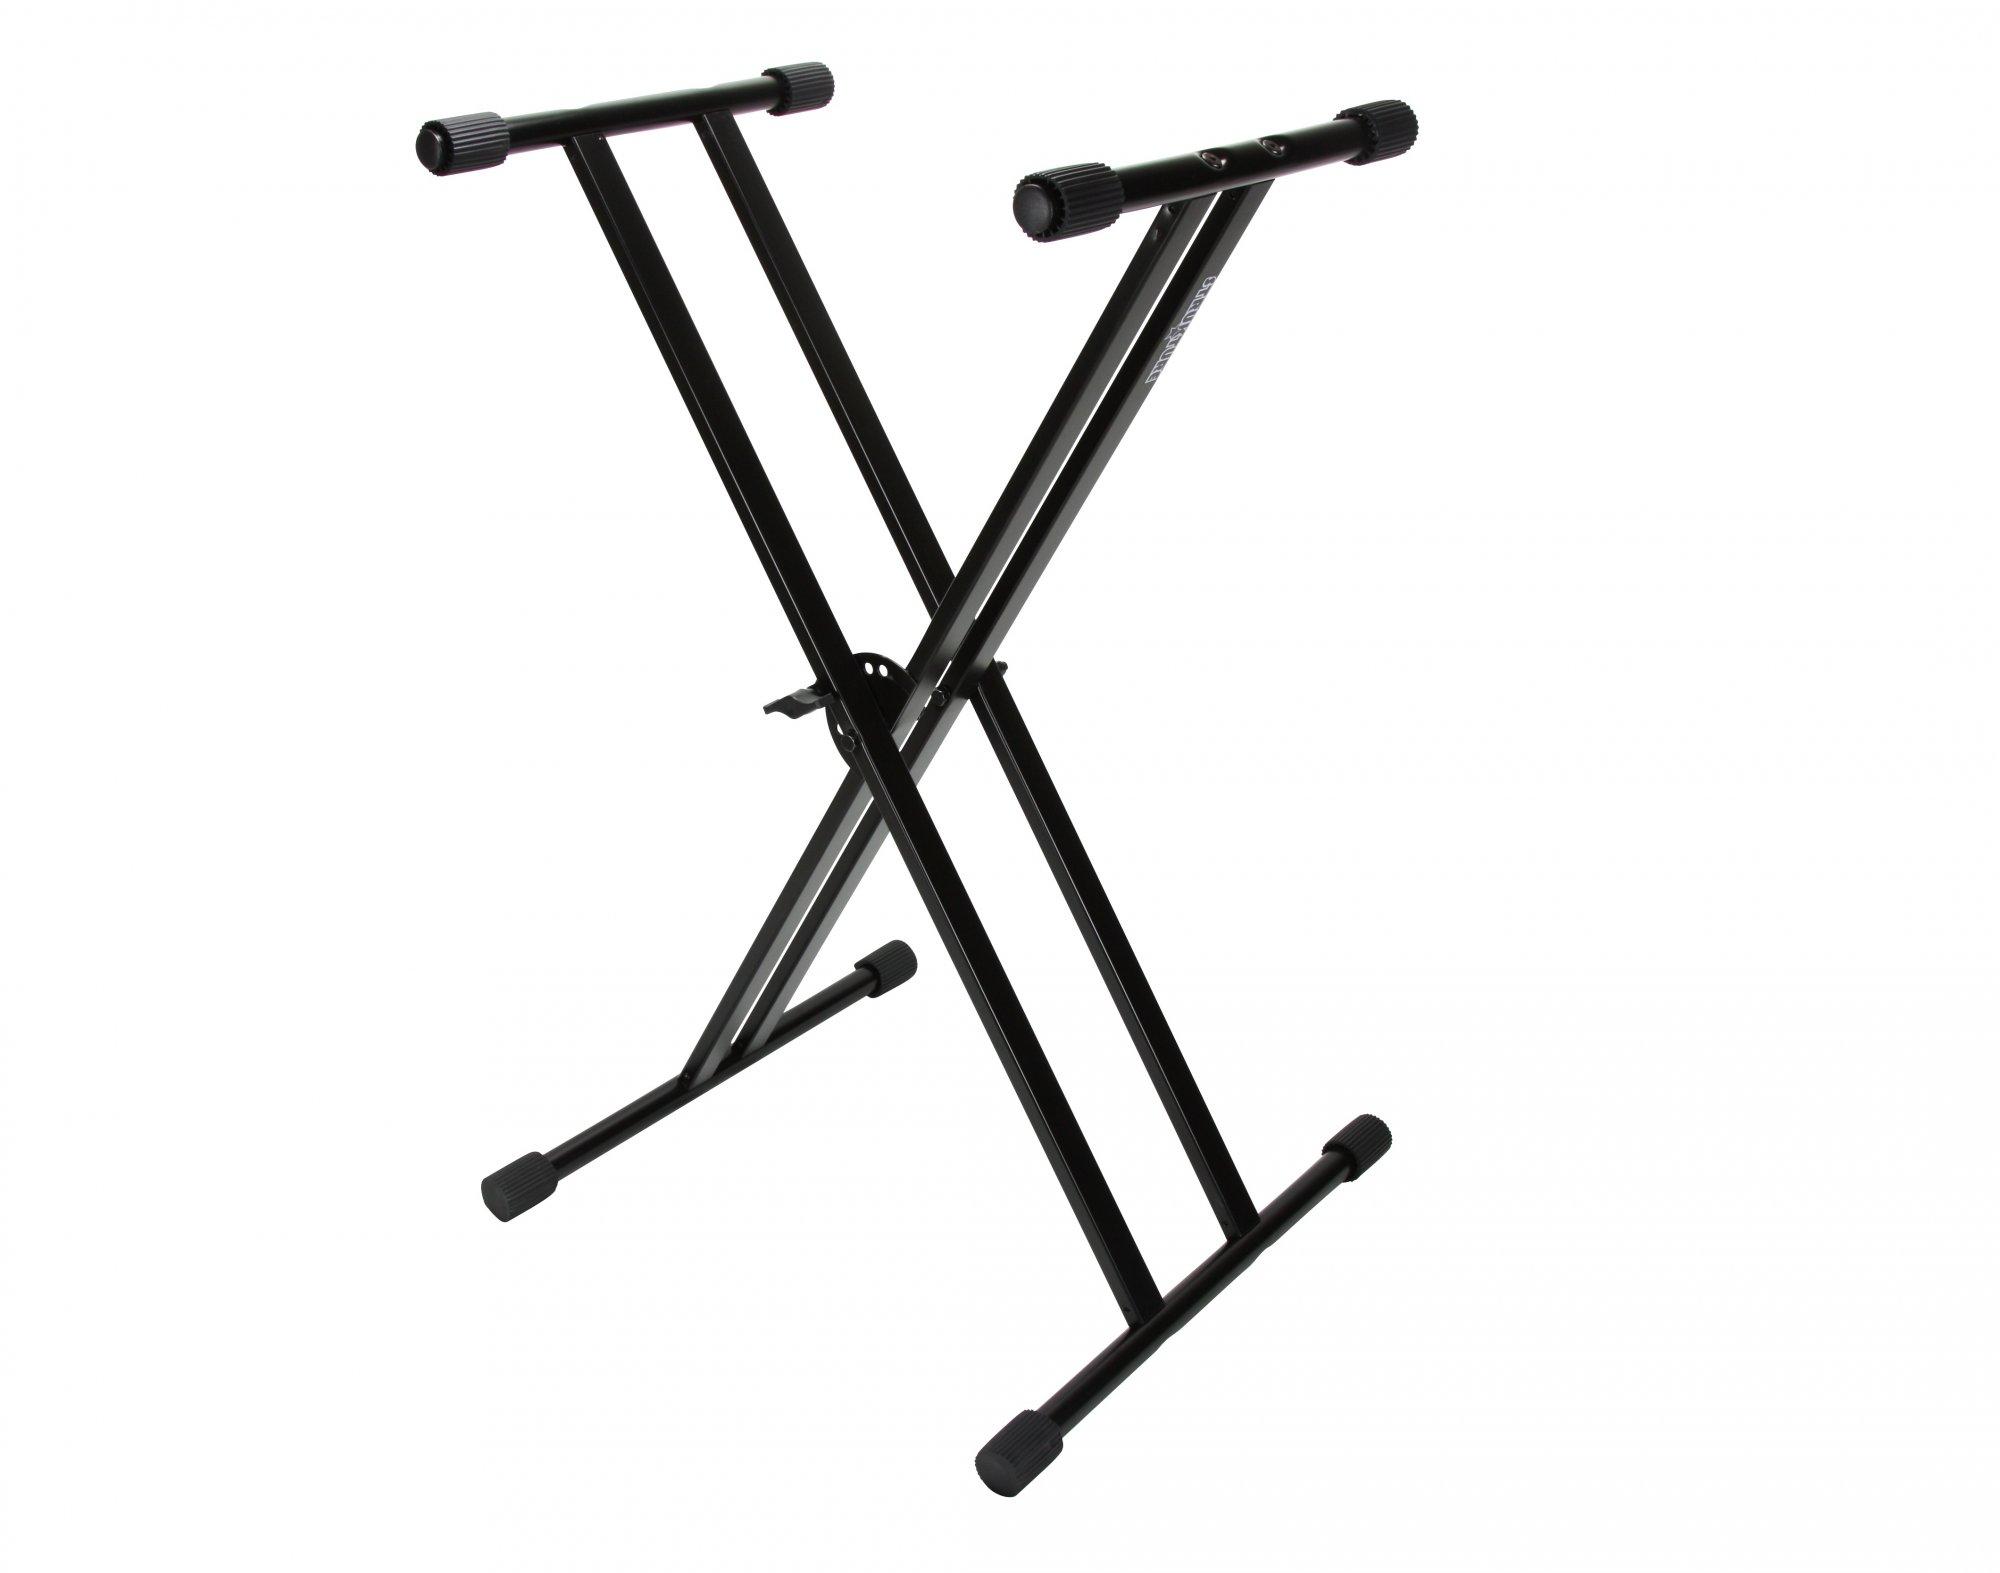 Strukture Economy Knockdown Double Braced Keyboard Stand, Black